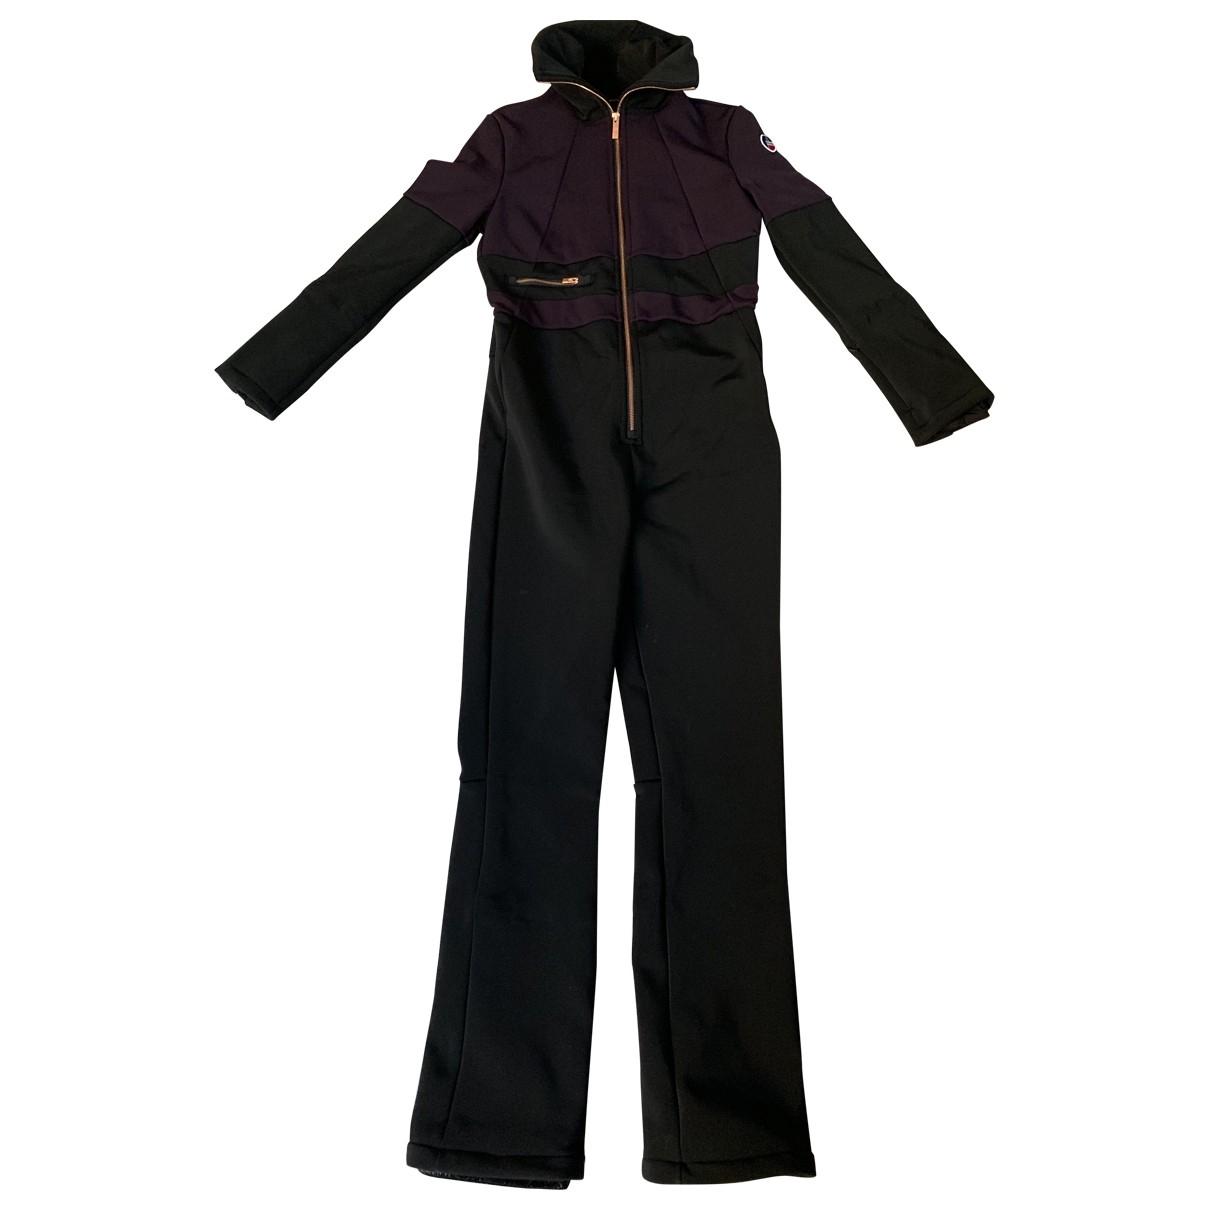 Fusalp \N Black jumpsuit for Women 44 FR